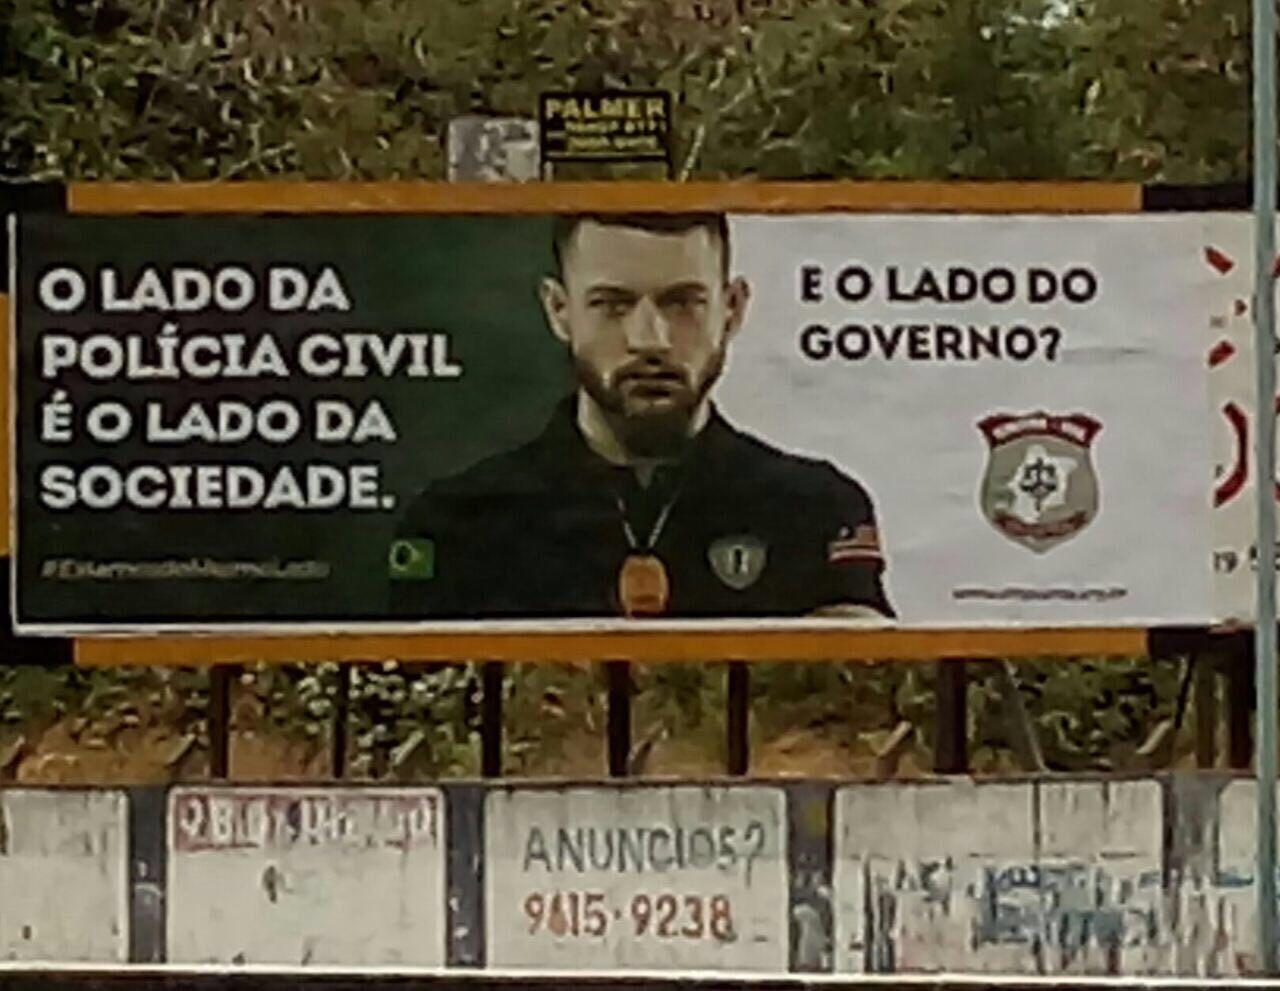 https://luiscardoso.com.br/wp-content/uploads/2017/10/IMG_5949.jpg